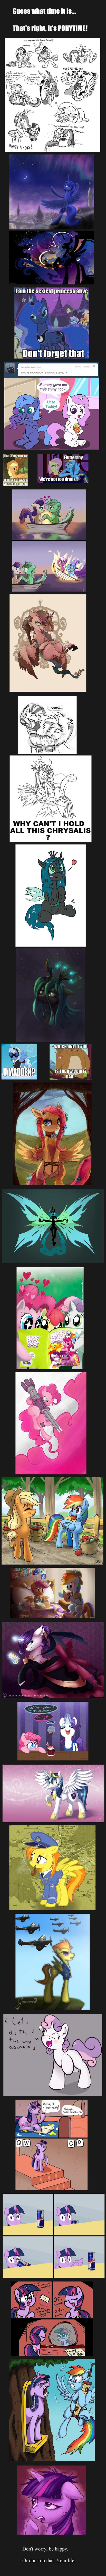 Ponycomp 235. Ponycomp 234: funnyjunk.com/channel/ponytime/Ponycomp+234/ManmGZn/ DOWNLOAD LINK docs.google.com/folder/d/0BzOyTFy8-sUIT1V3N09HYVpUUEk/edit?usp=sh My Little Pony ponies ponytime